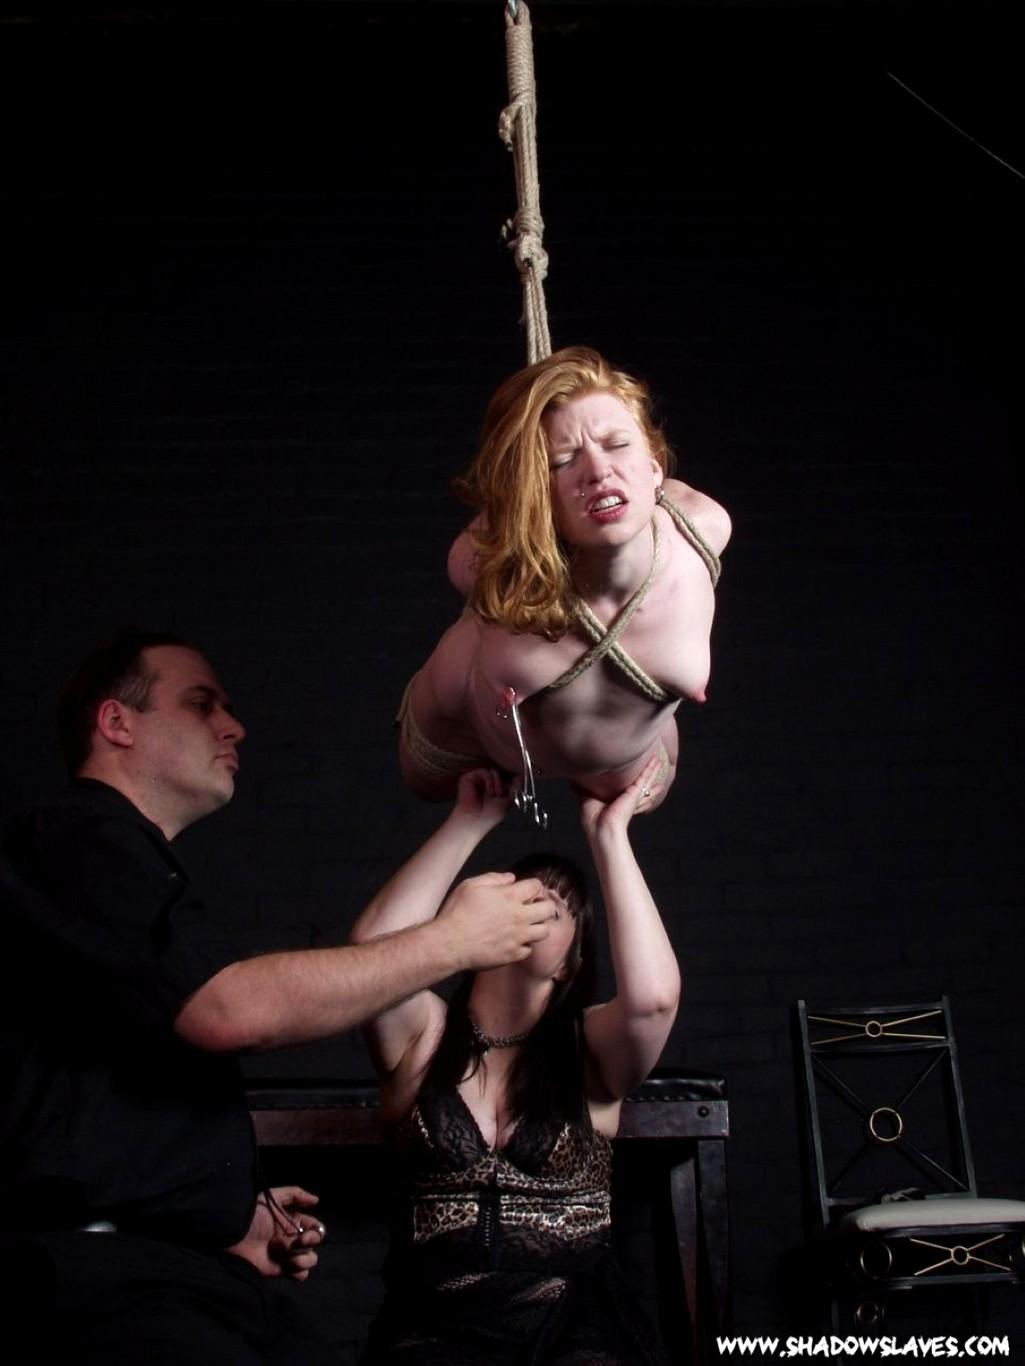 Furry bondage porn